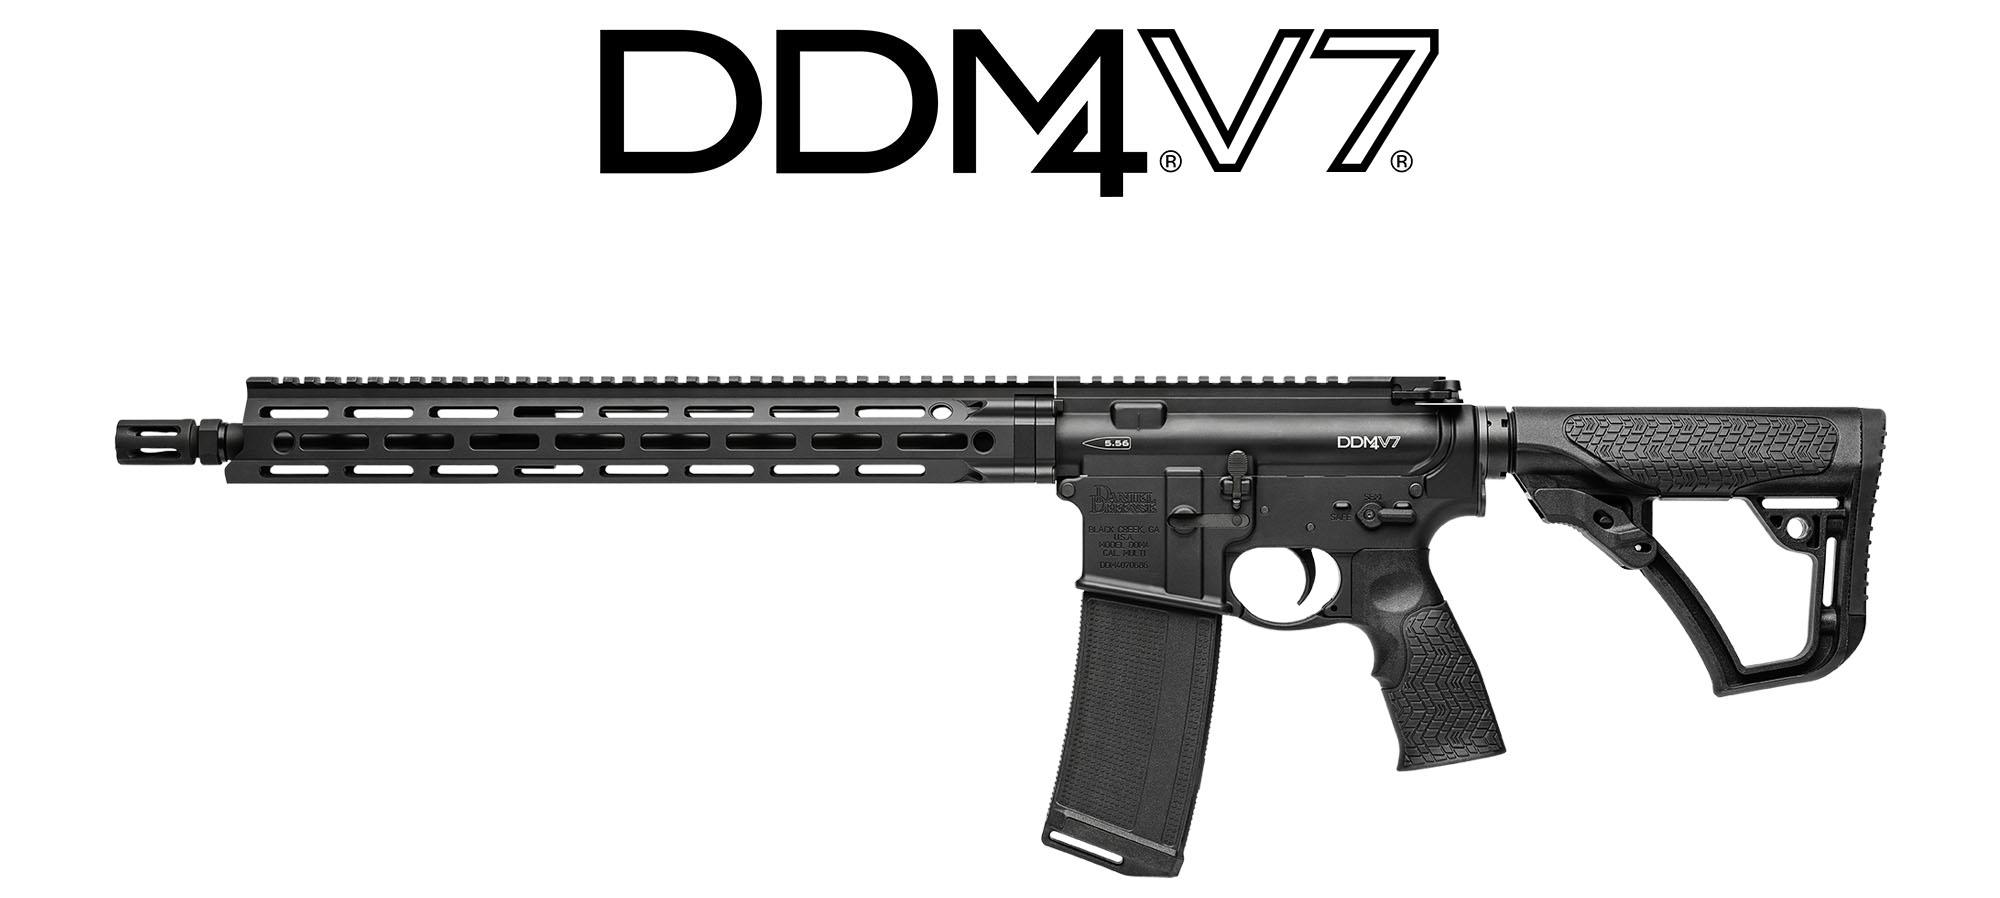 Daniel Defense DDM4 V7 Rifle